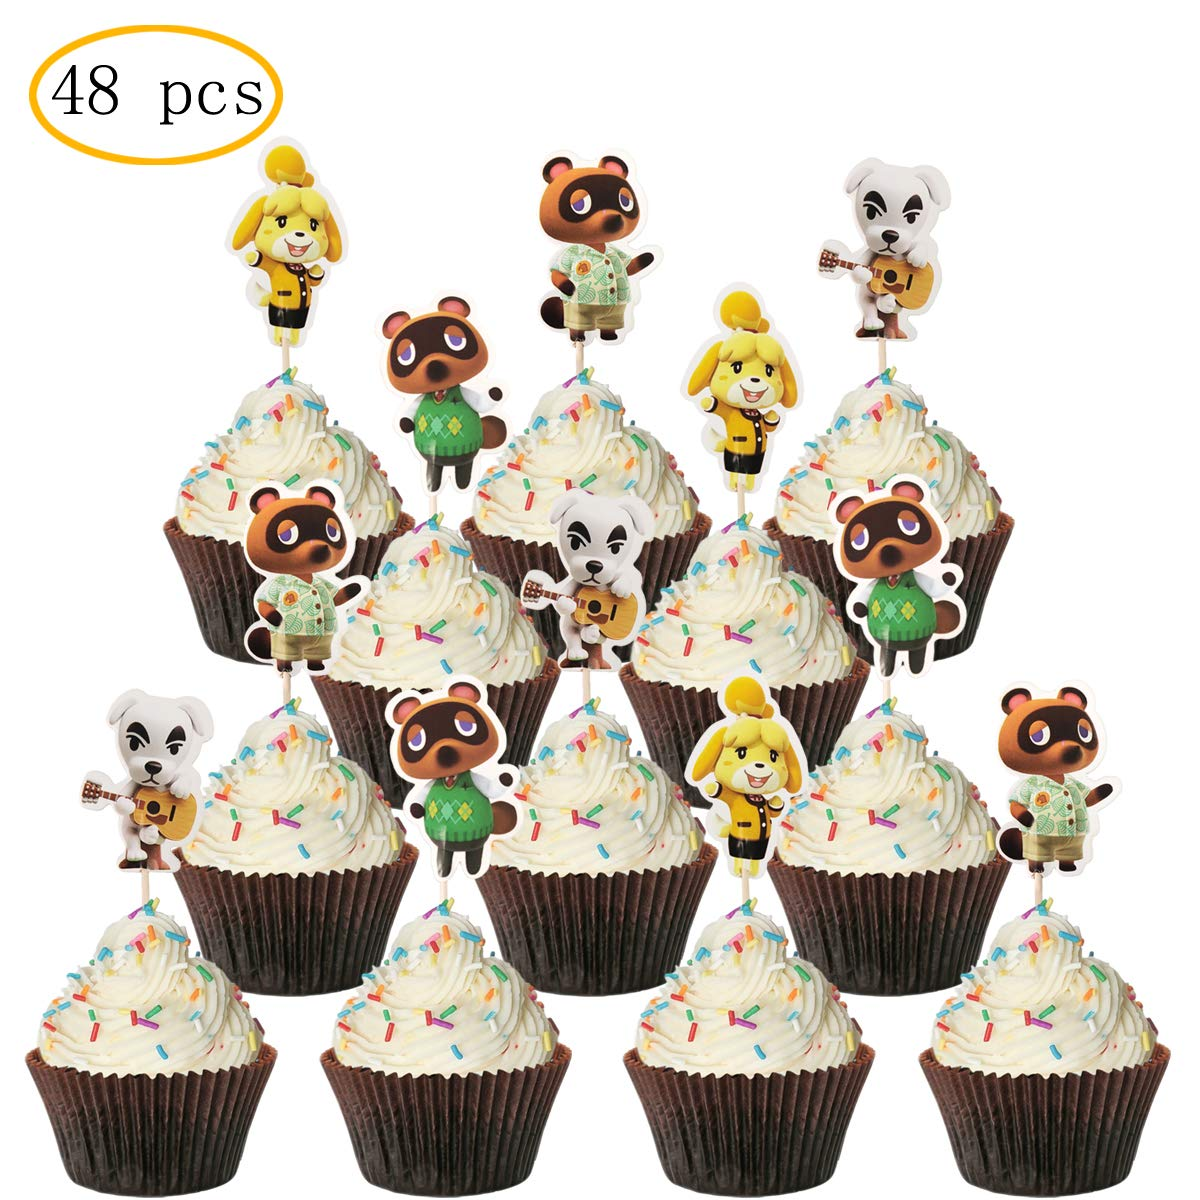 Animal Crossing Party Supply Animal Crossing Print Animal Crossing Centerpiece, Animal Crossing Cake Topper Animal Crossing Birthday